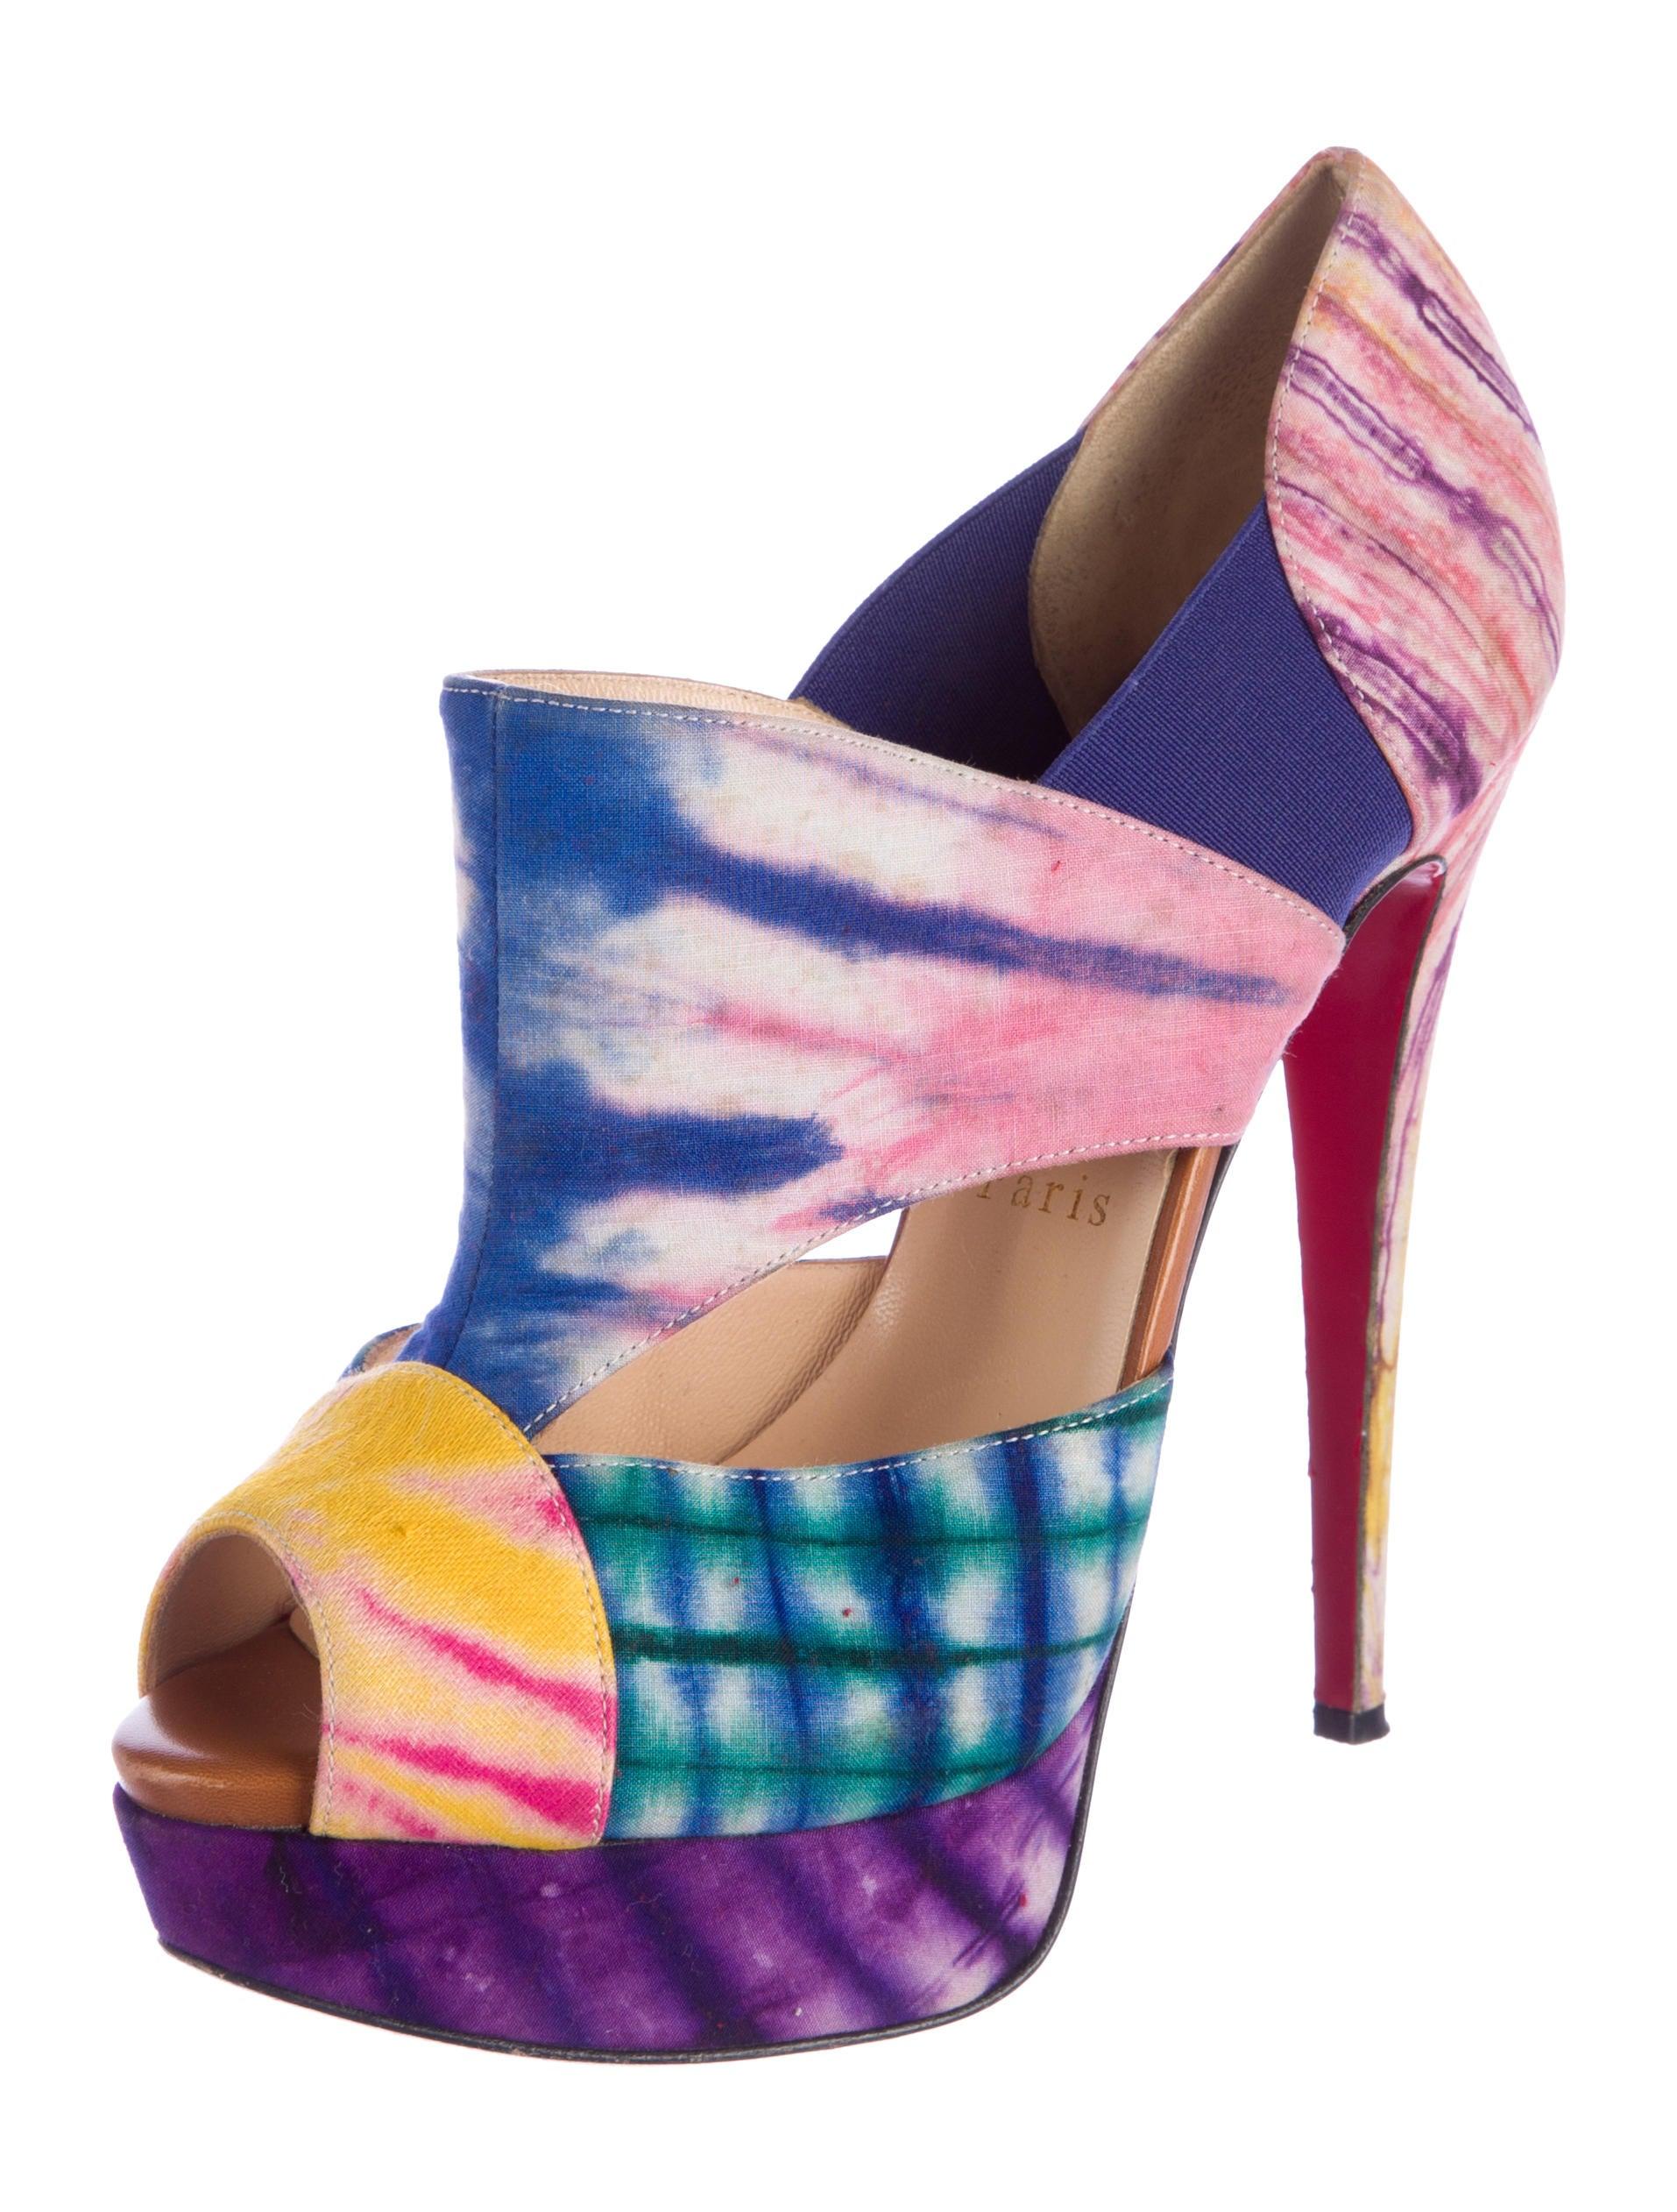 christian louboutin tie-dye slide sandals